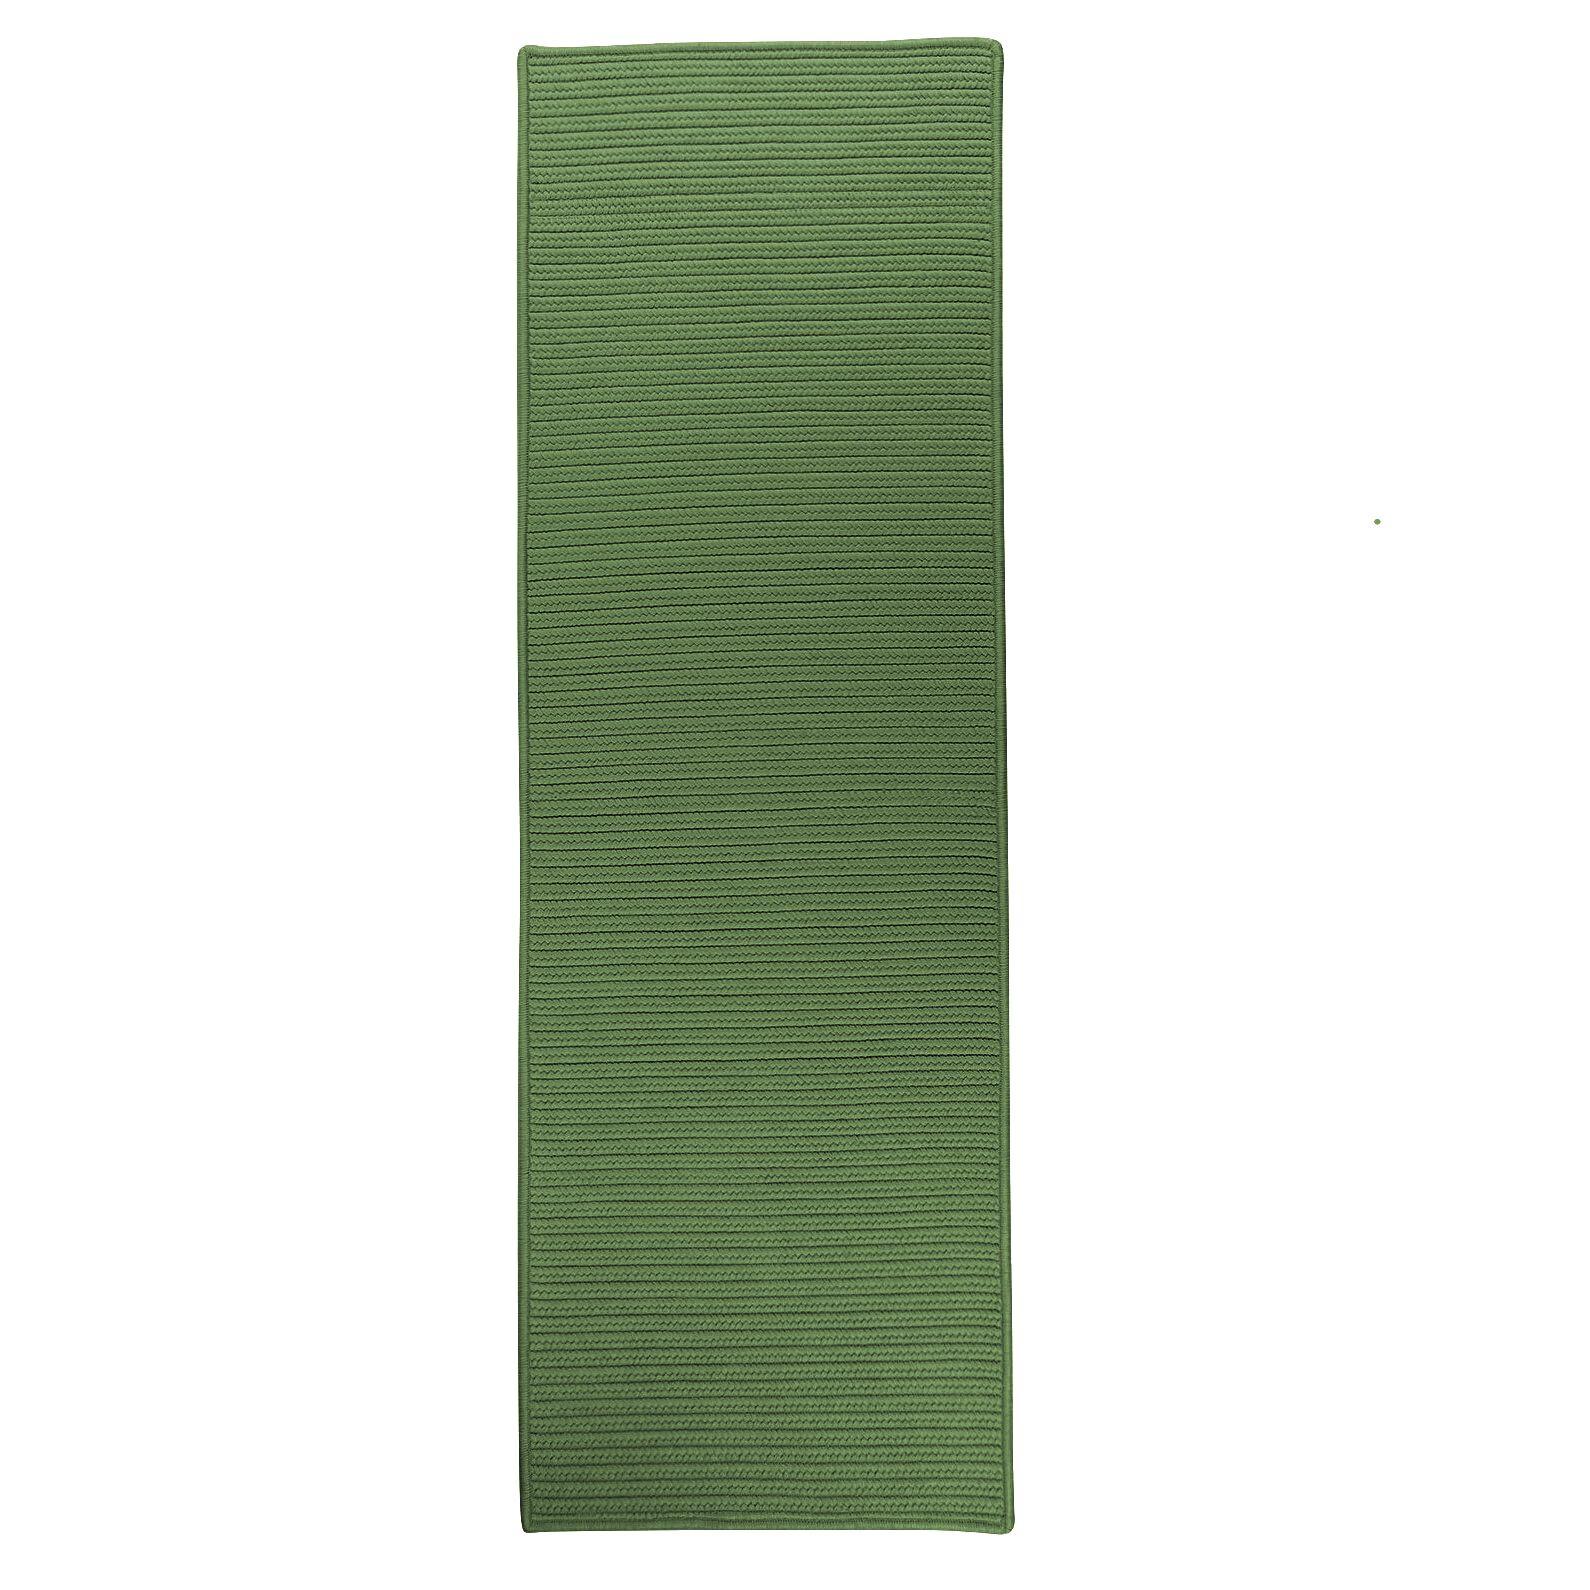 Ashlee Reversible Hand-Braided Green Indoor/Outdoor Area Rug Rug Size: Runner 2'4